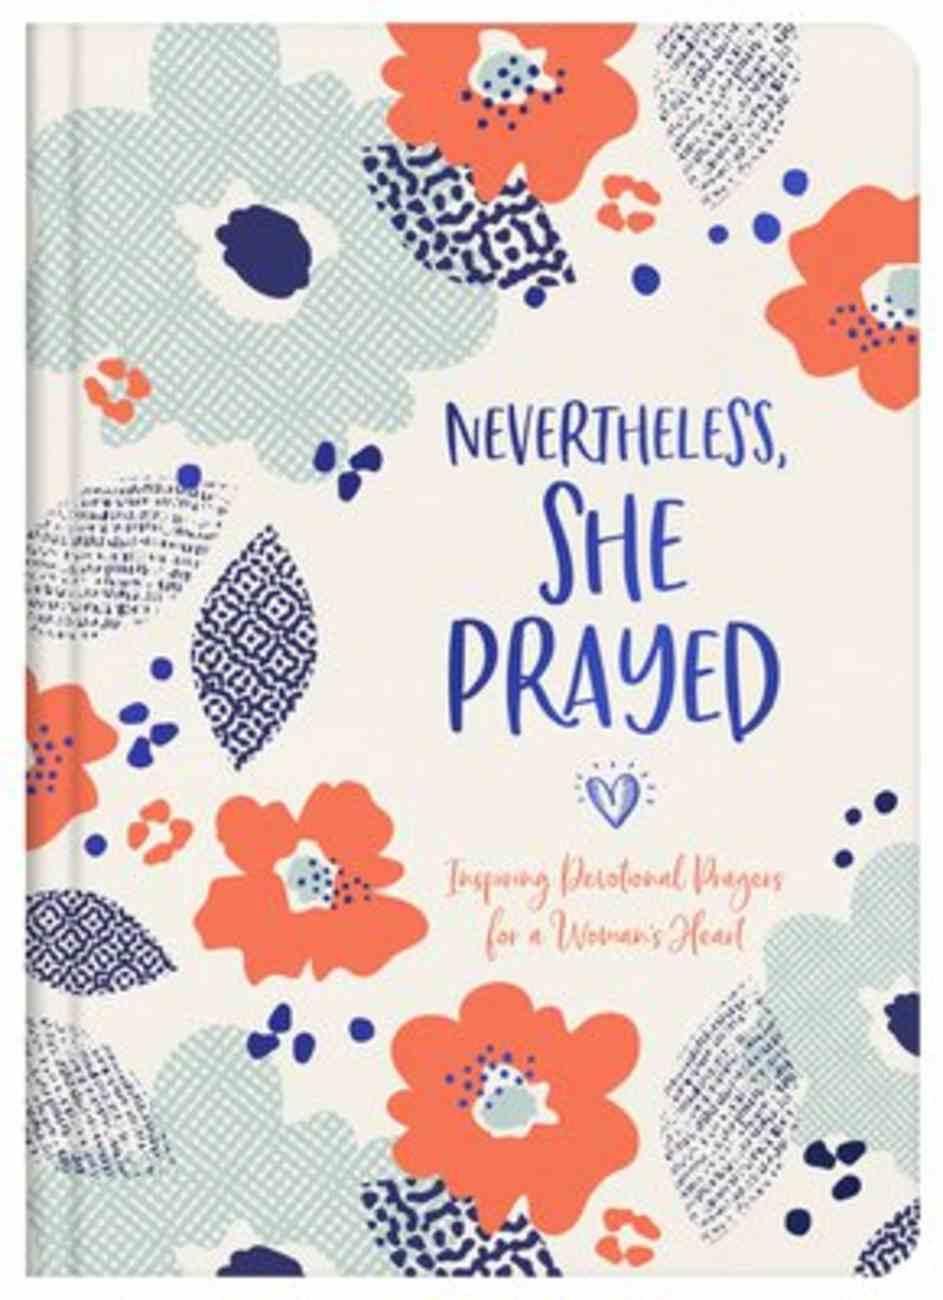 Nevertheless, She Prayed: Inspiring Devotional Prayers For a Woman's Heart Hardback